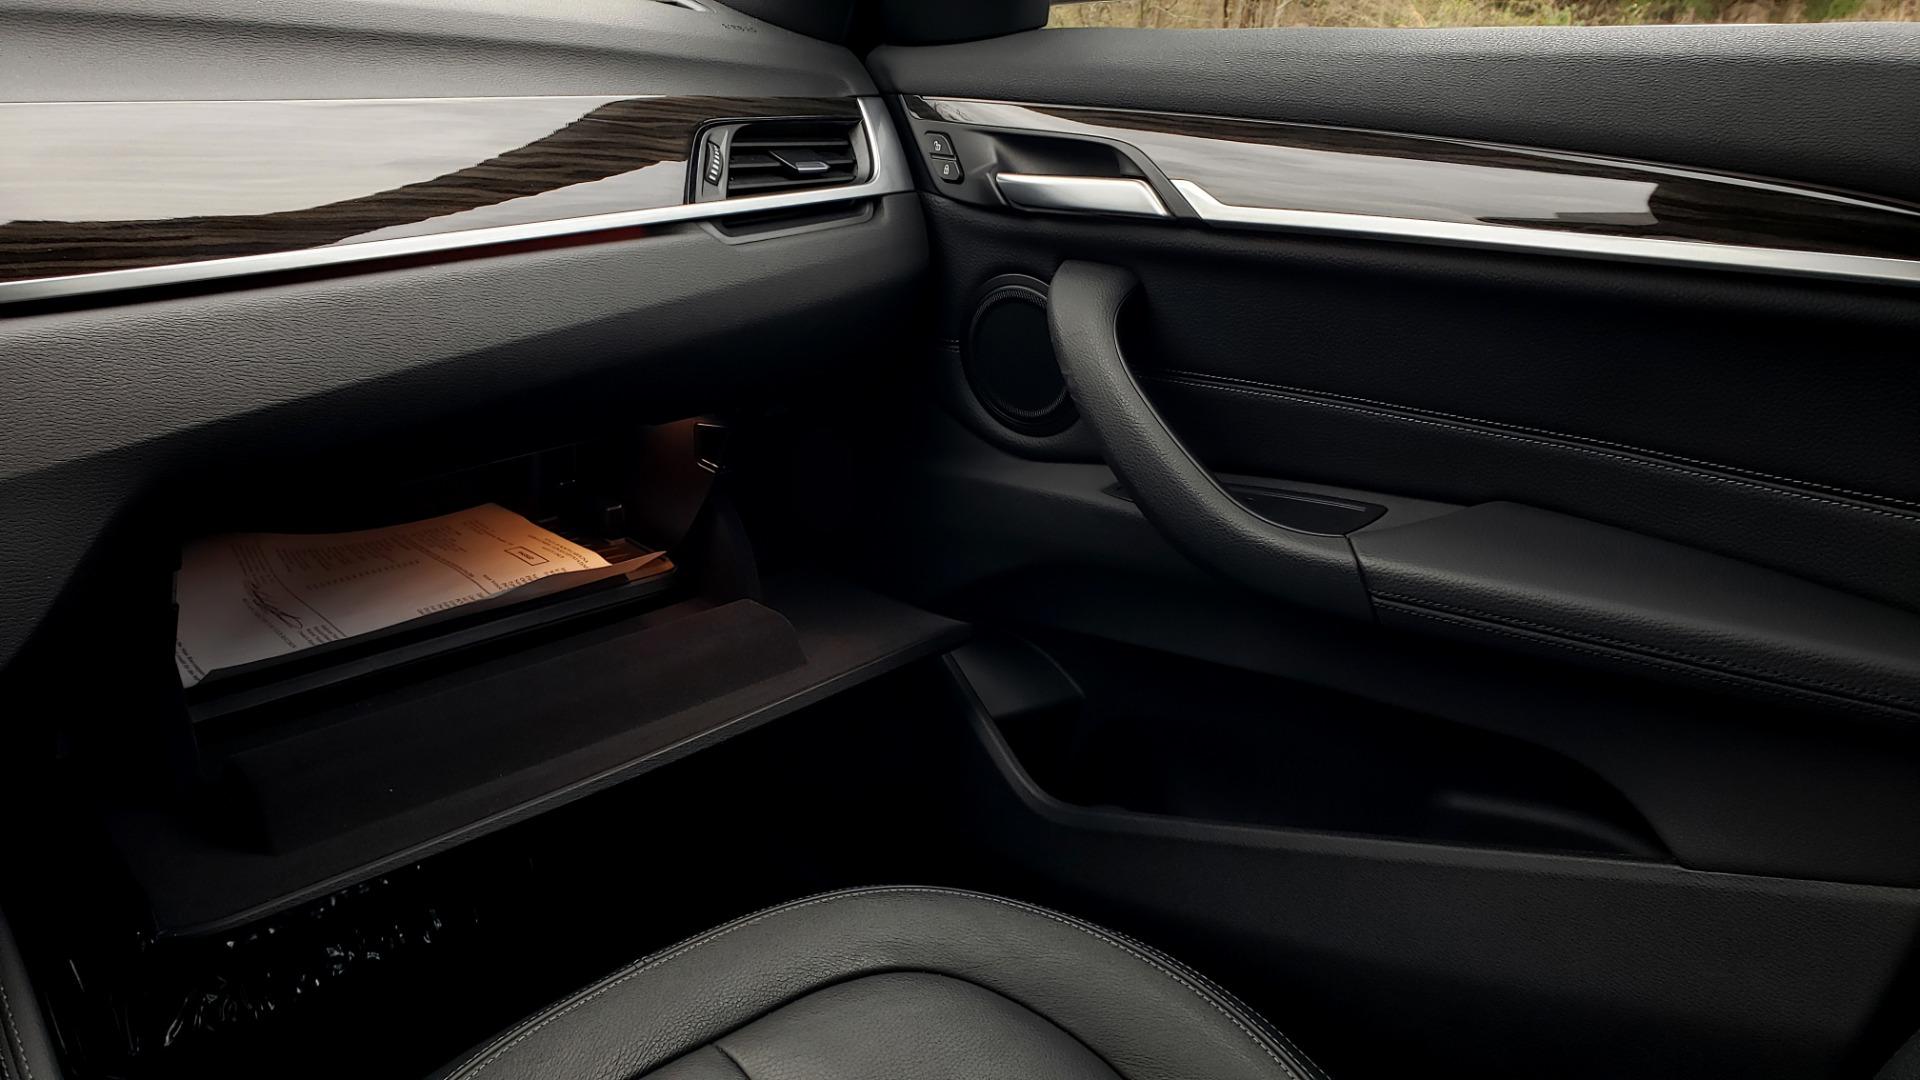 Used 2017 BMW X1 XDRIVE28I / PREM PKG / DRIVER ASST / NAV / CLD WTHR for sale Sold at Formula Imports in Charlotte NC 28227 54